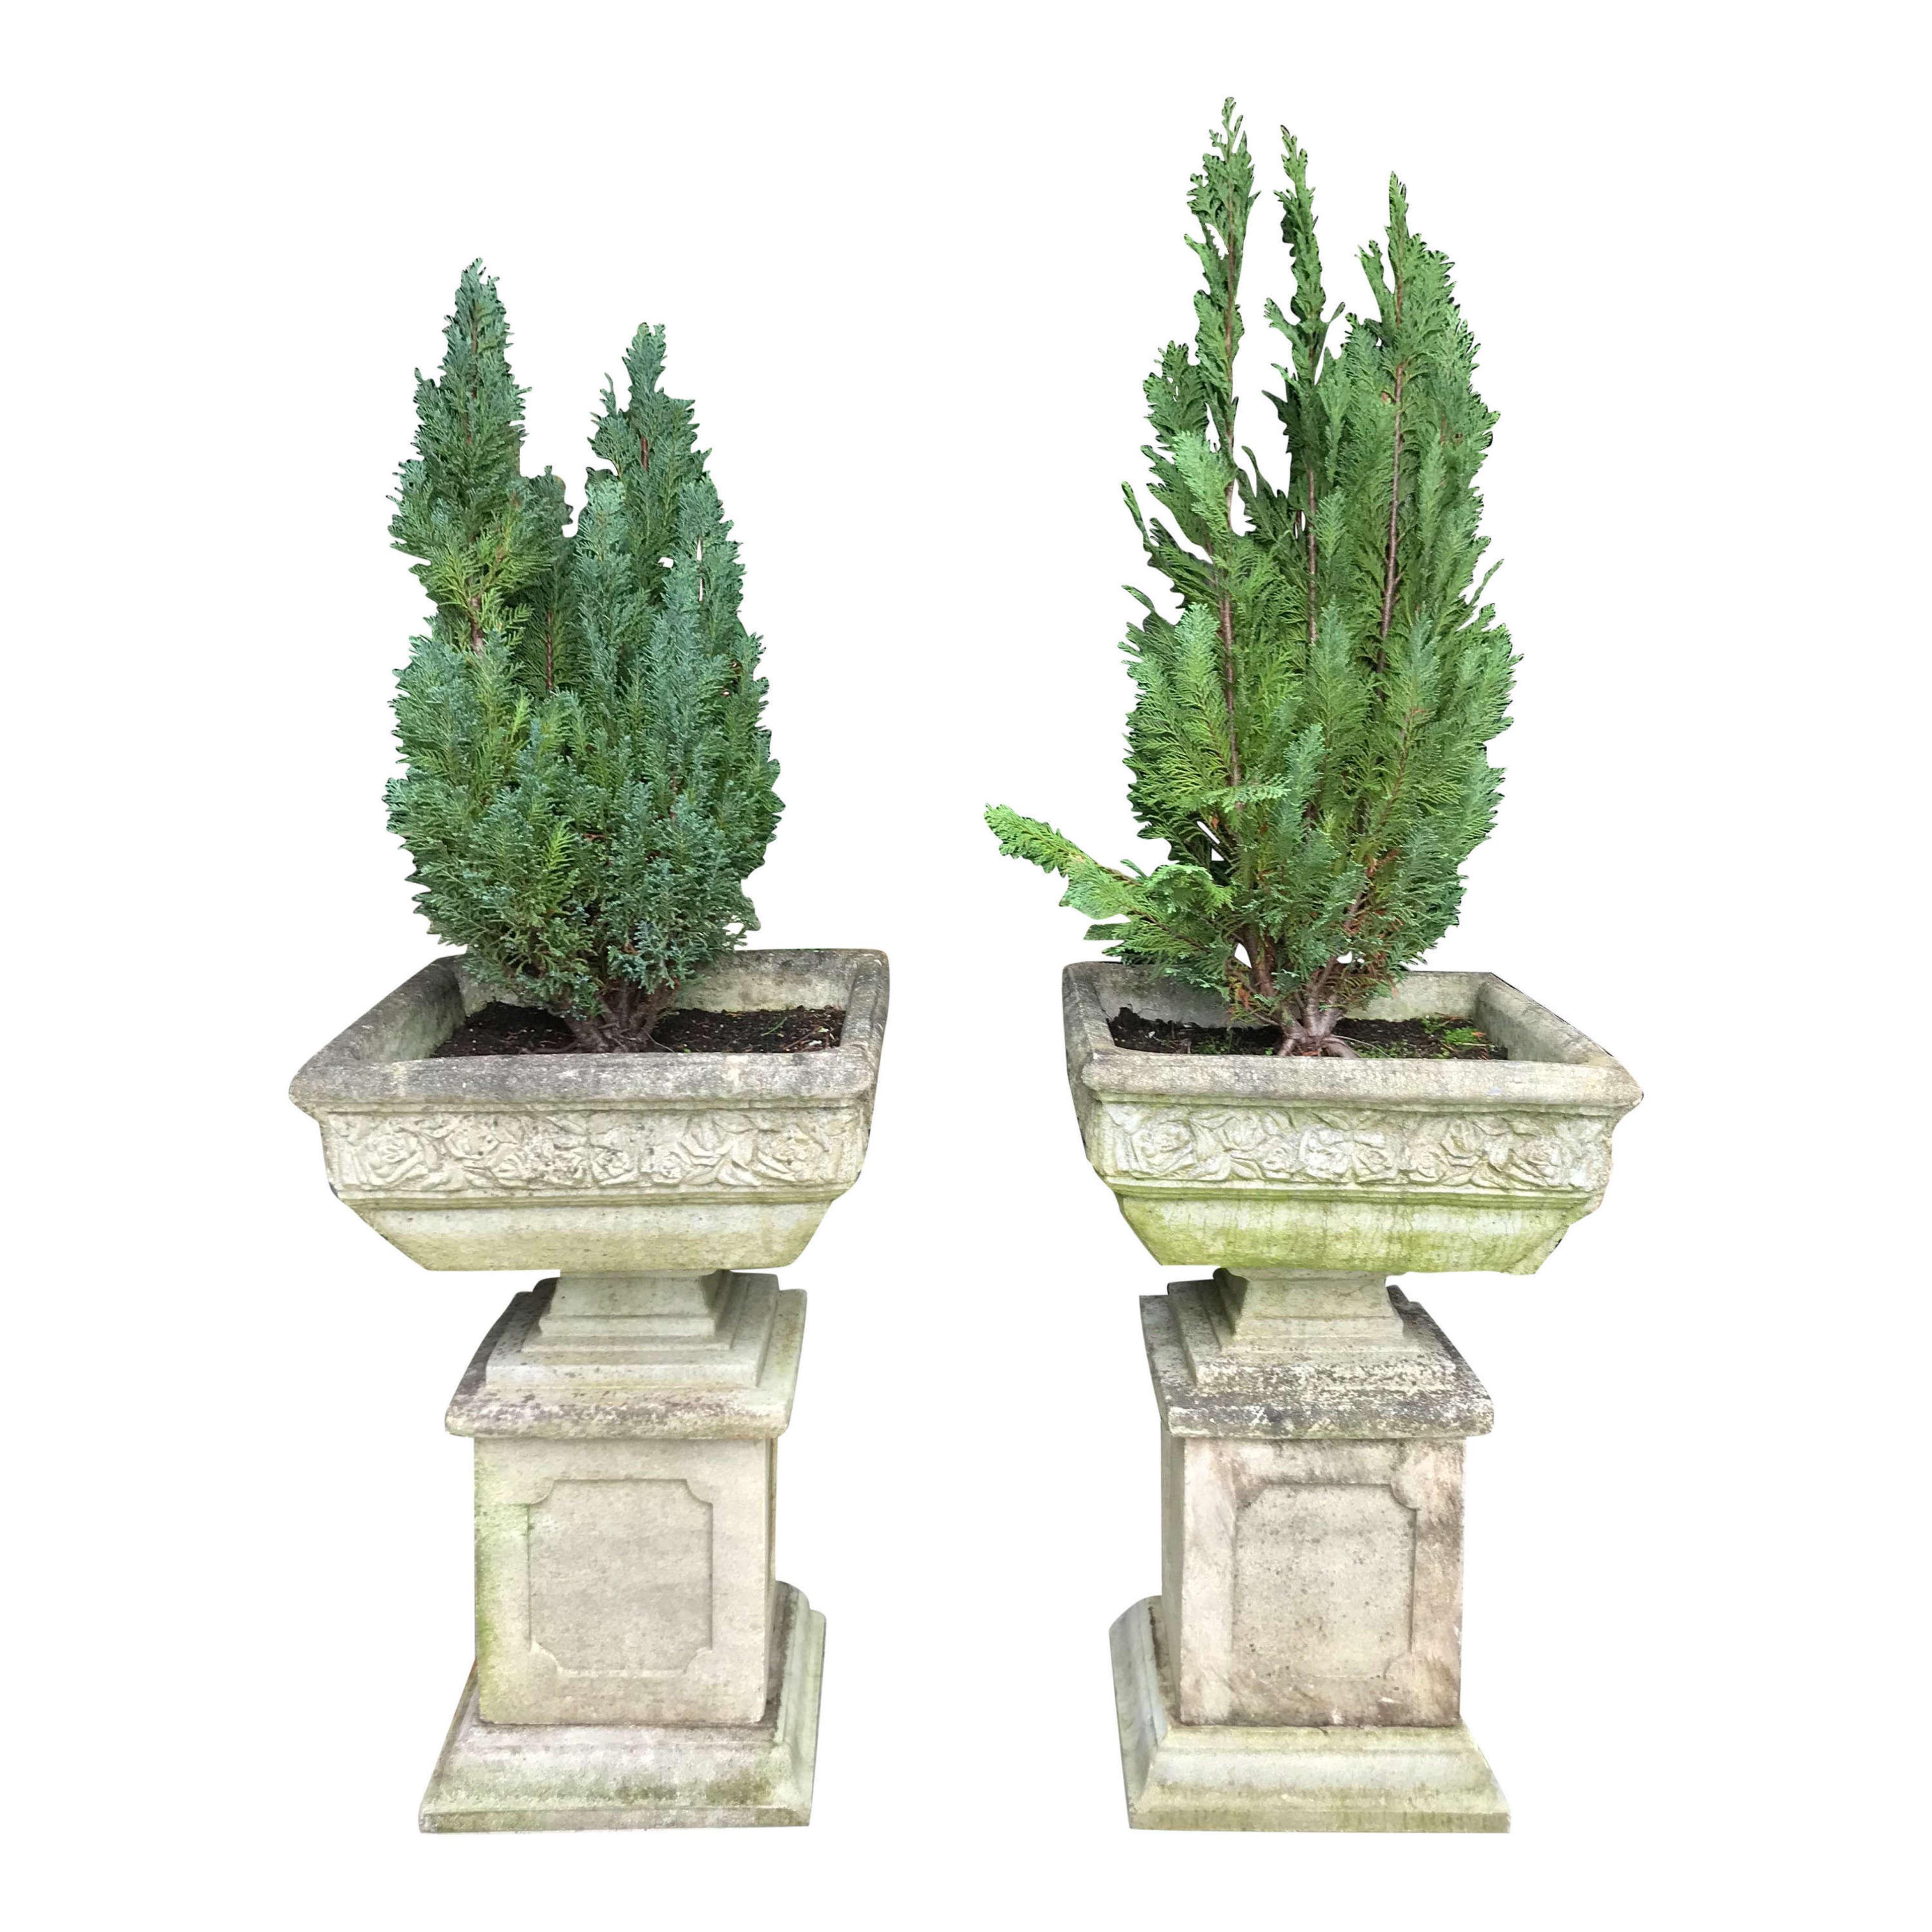 Pair of 20th Century Recon Stone Garden Planters on Plinths